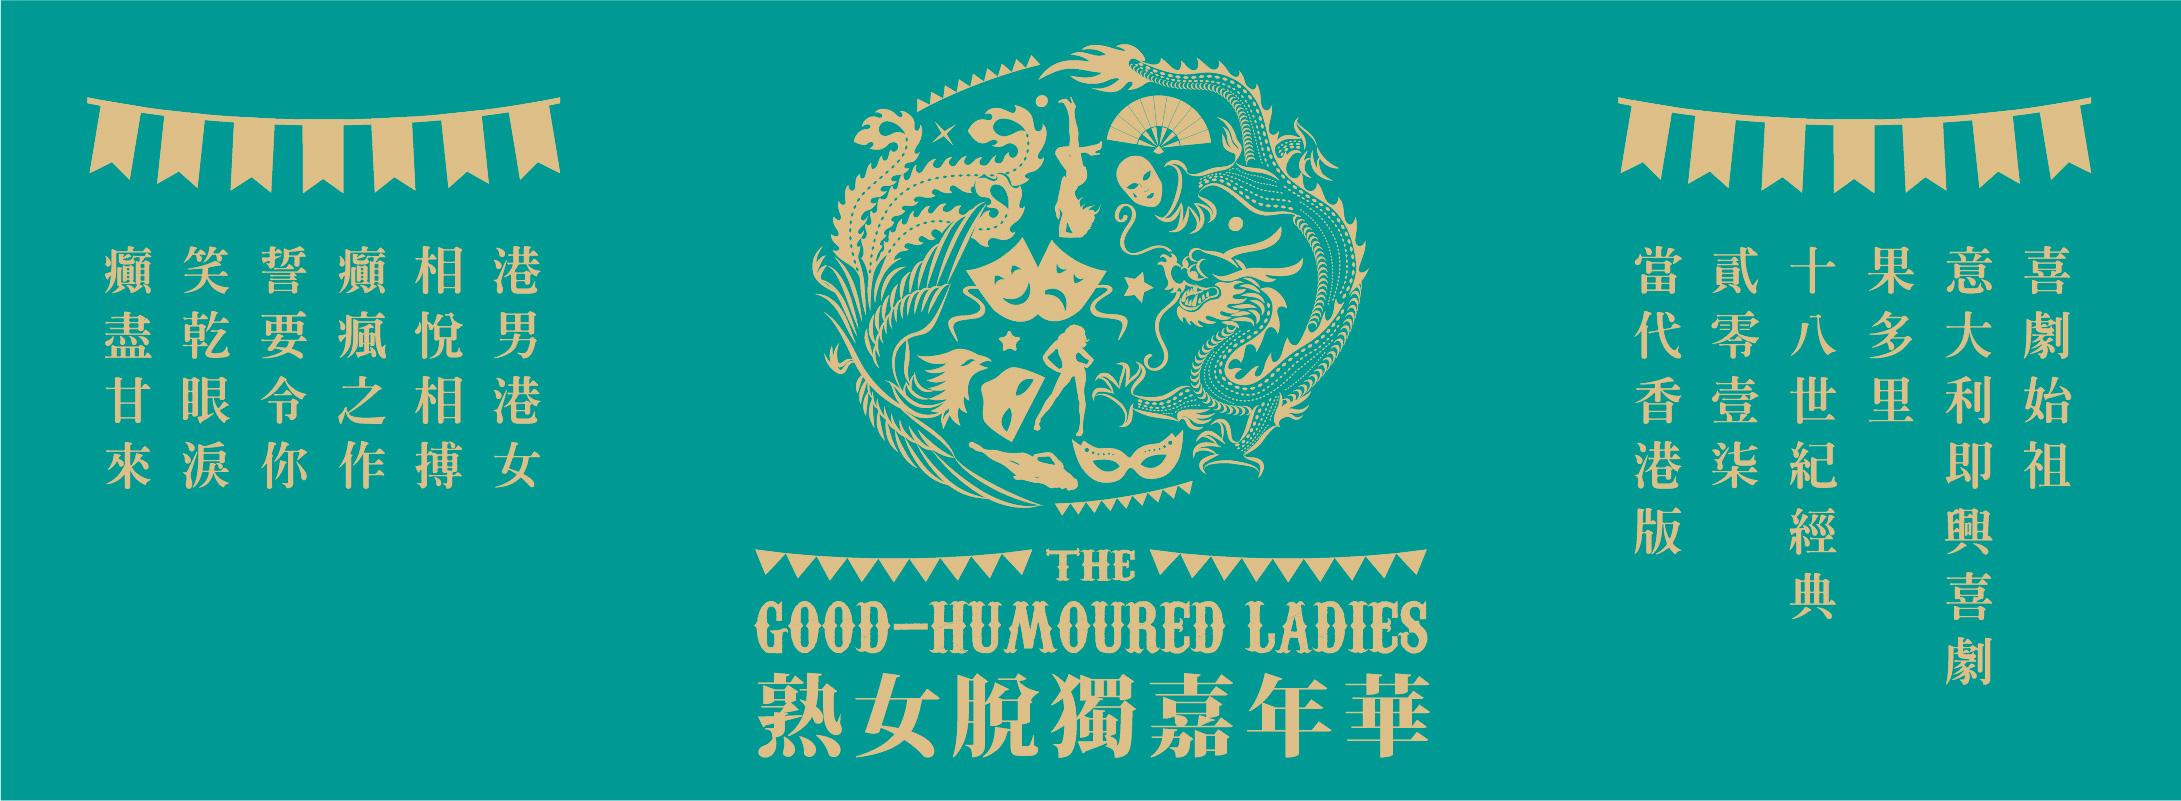 The Good-Humoured Ladies website banner-01 (1)